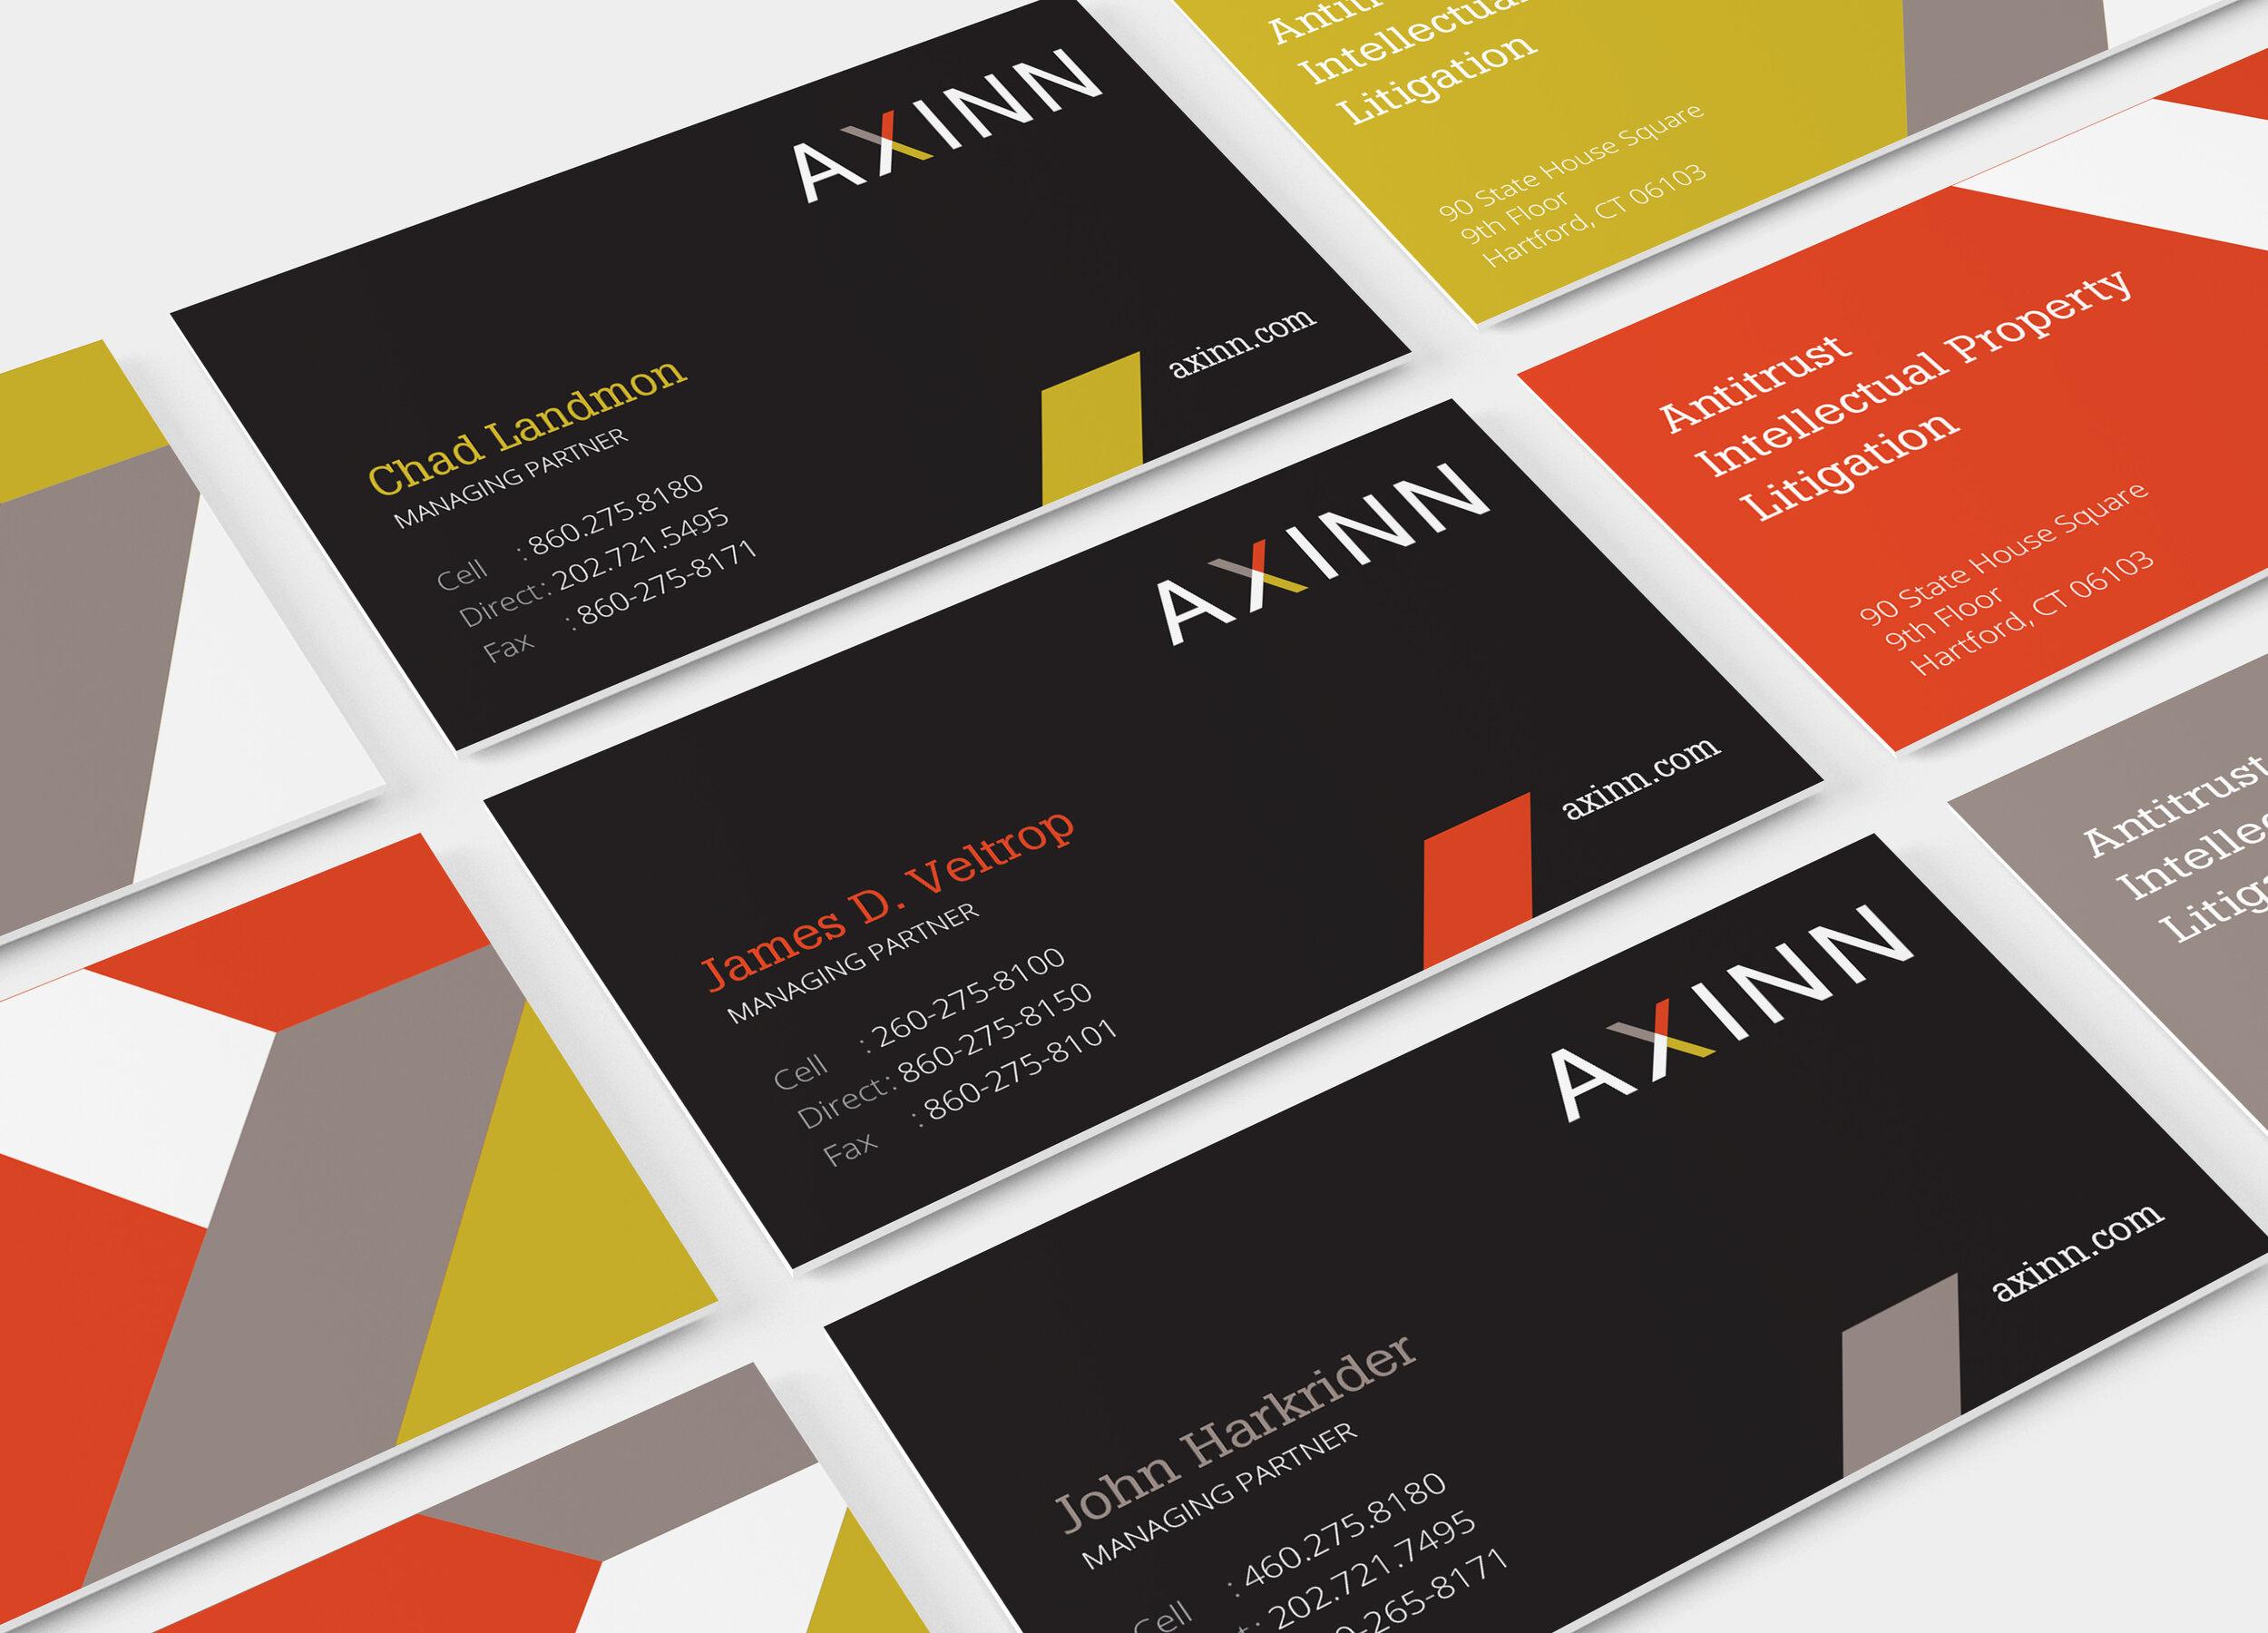 axinn business card.jpg